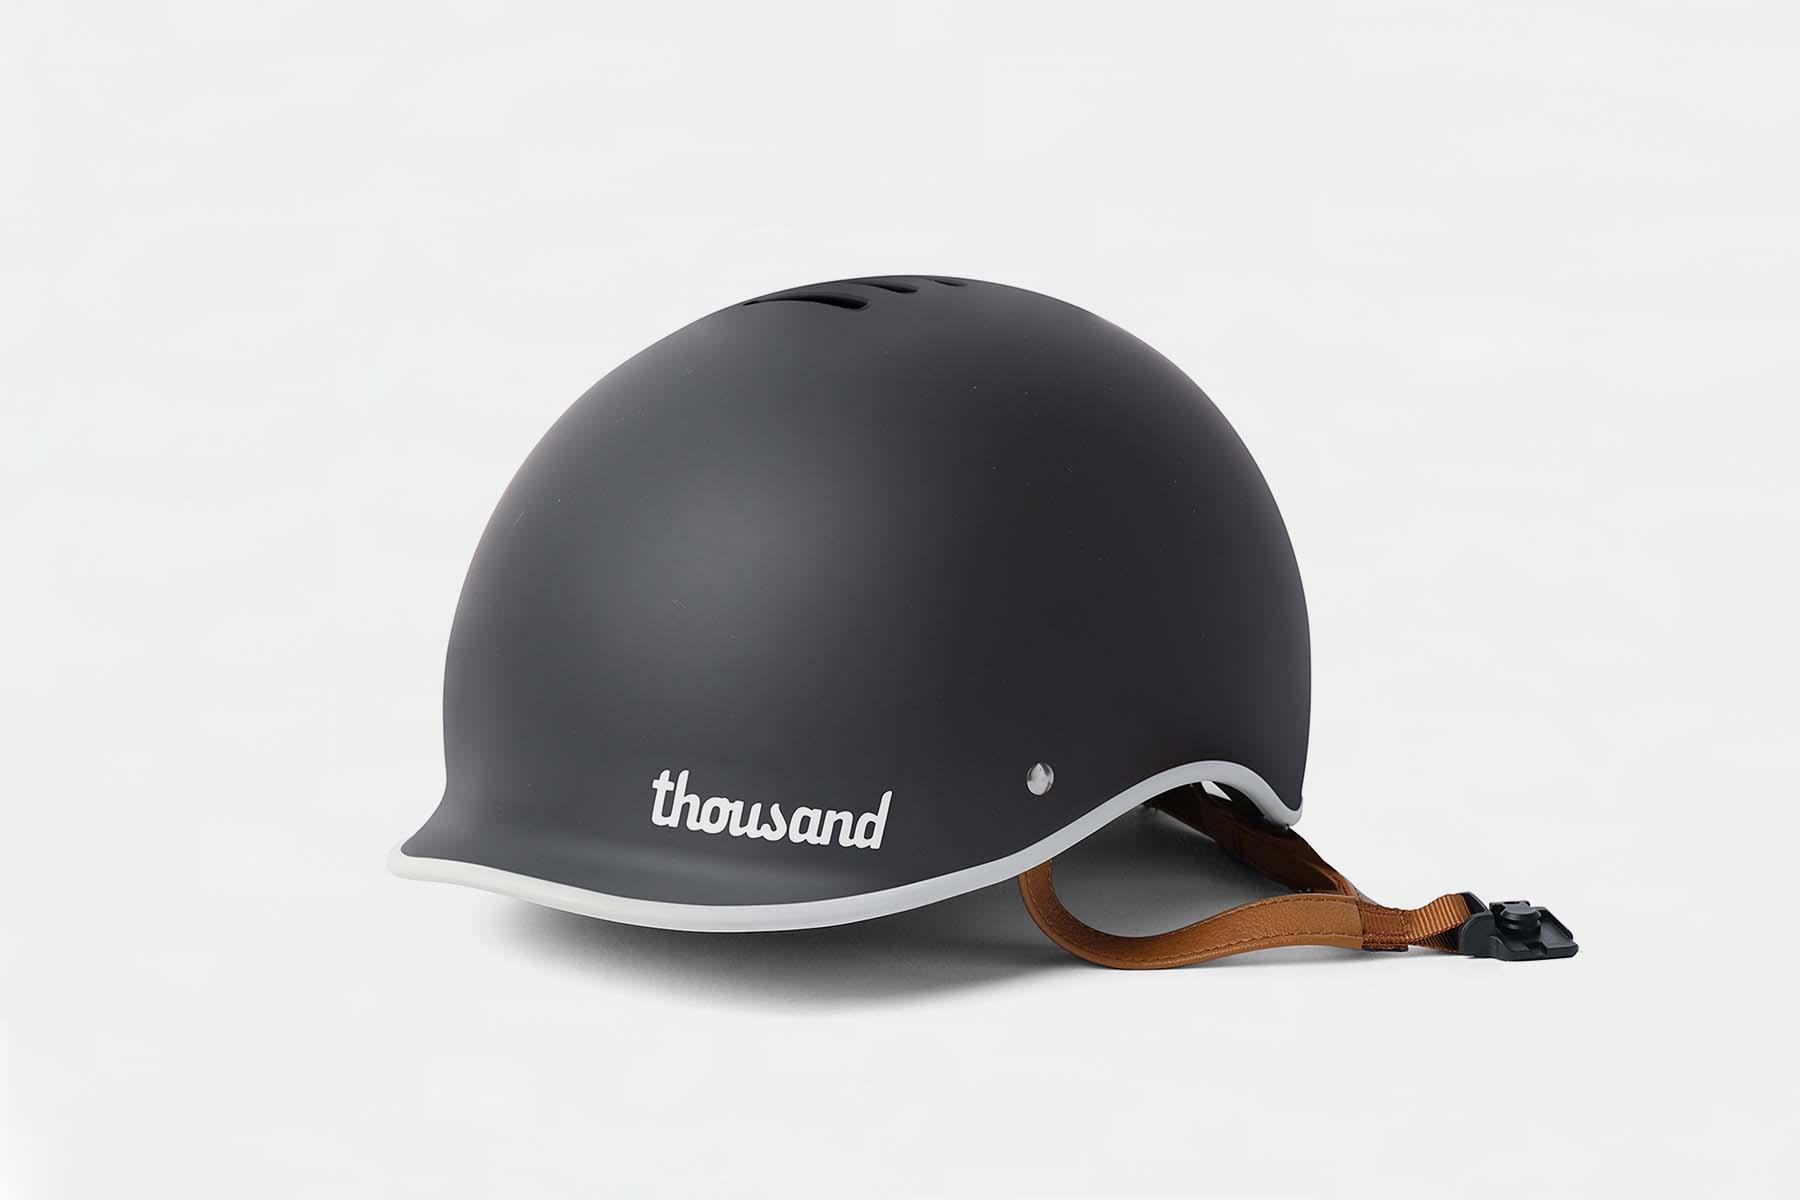 Thousand Helmet | Heritage Collection